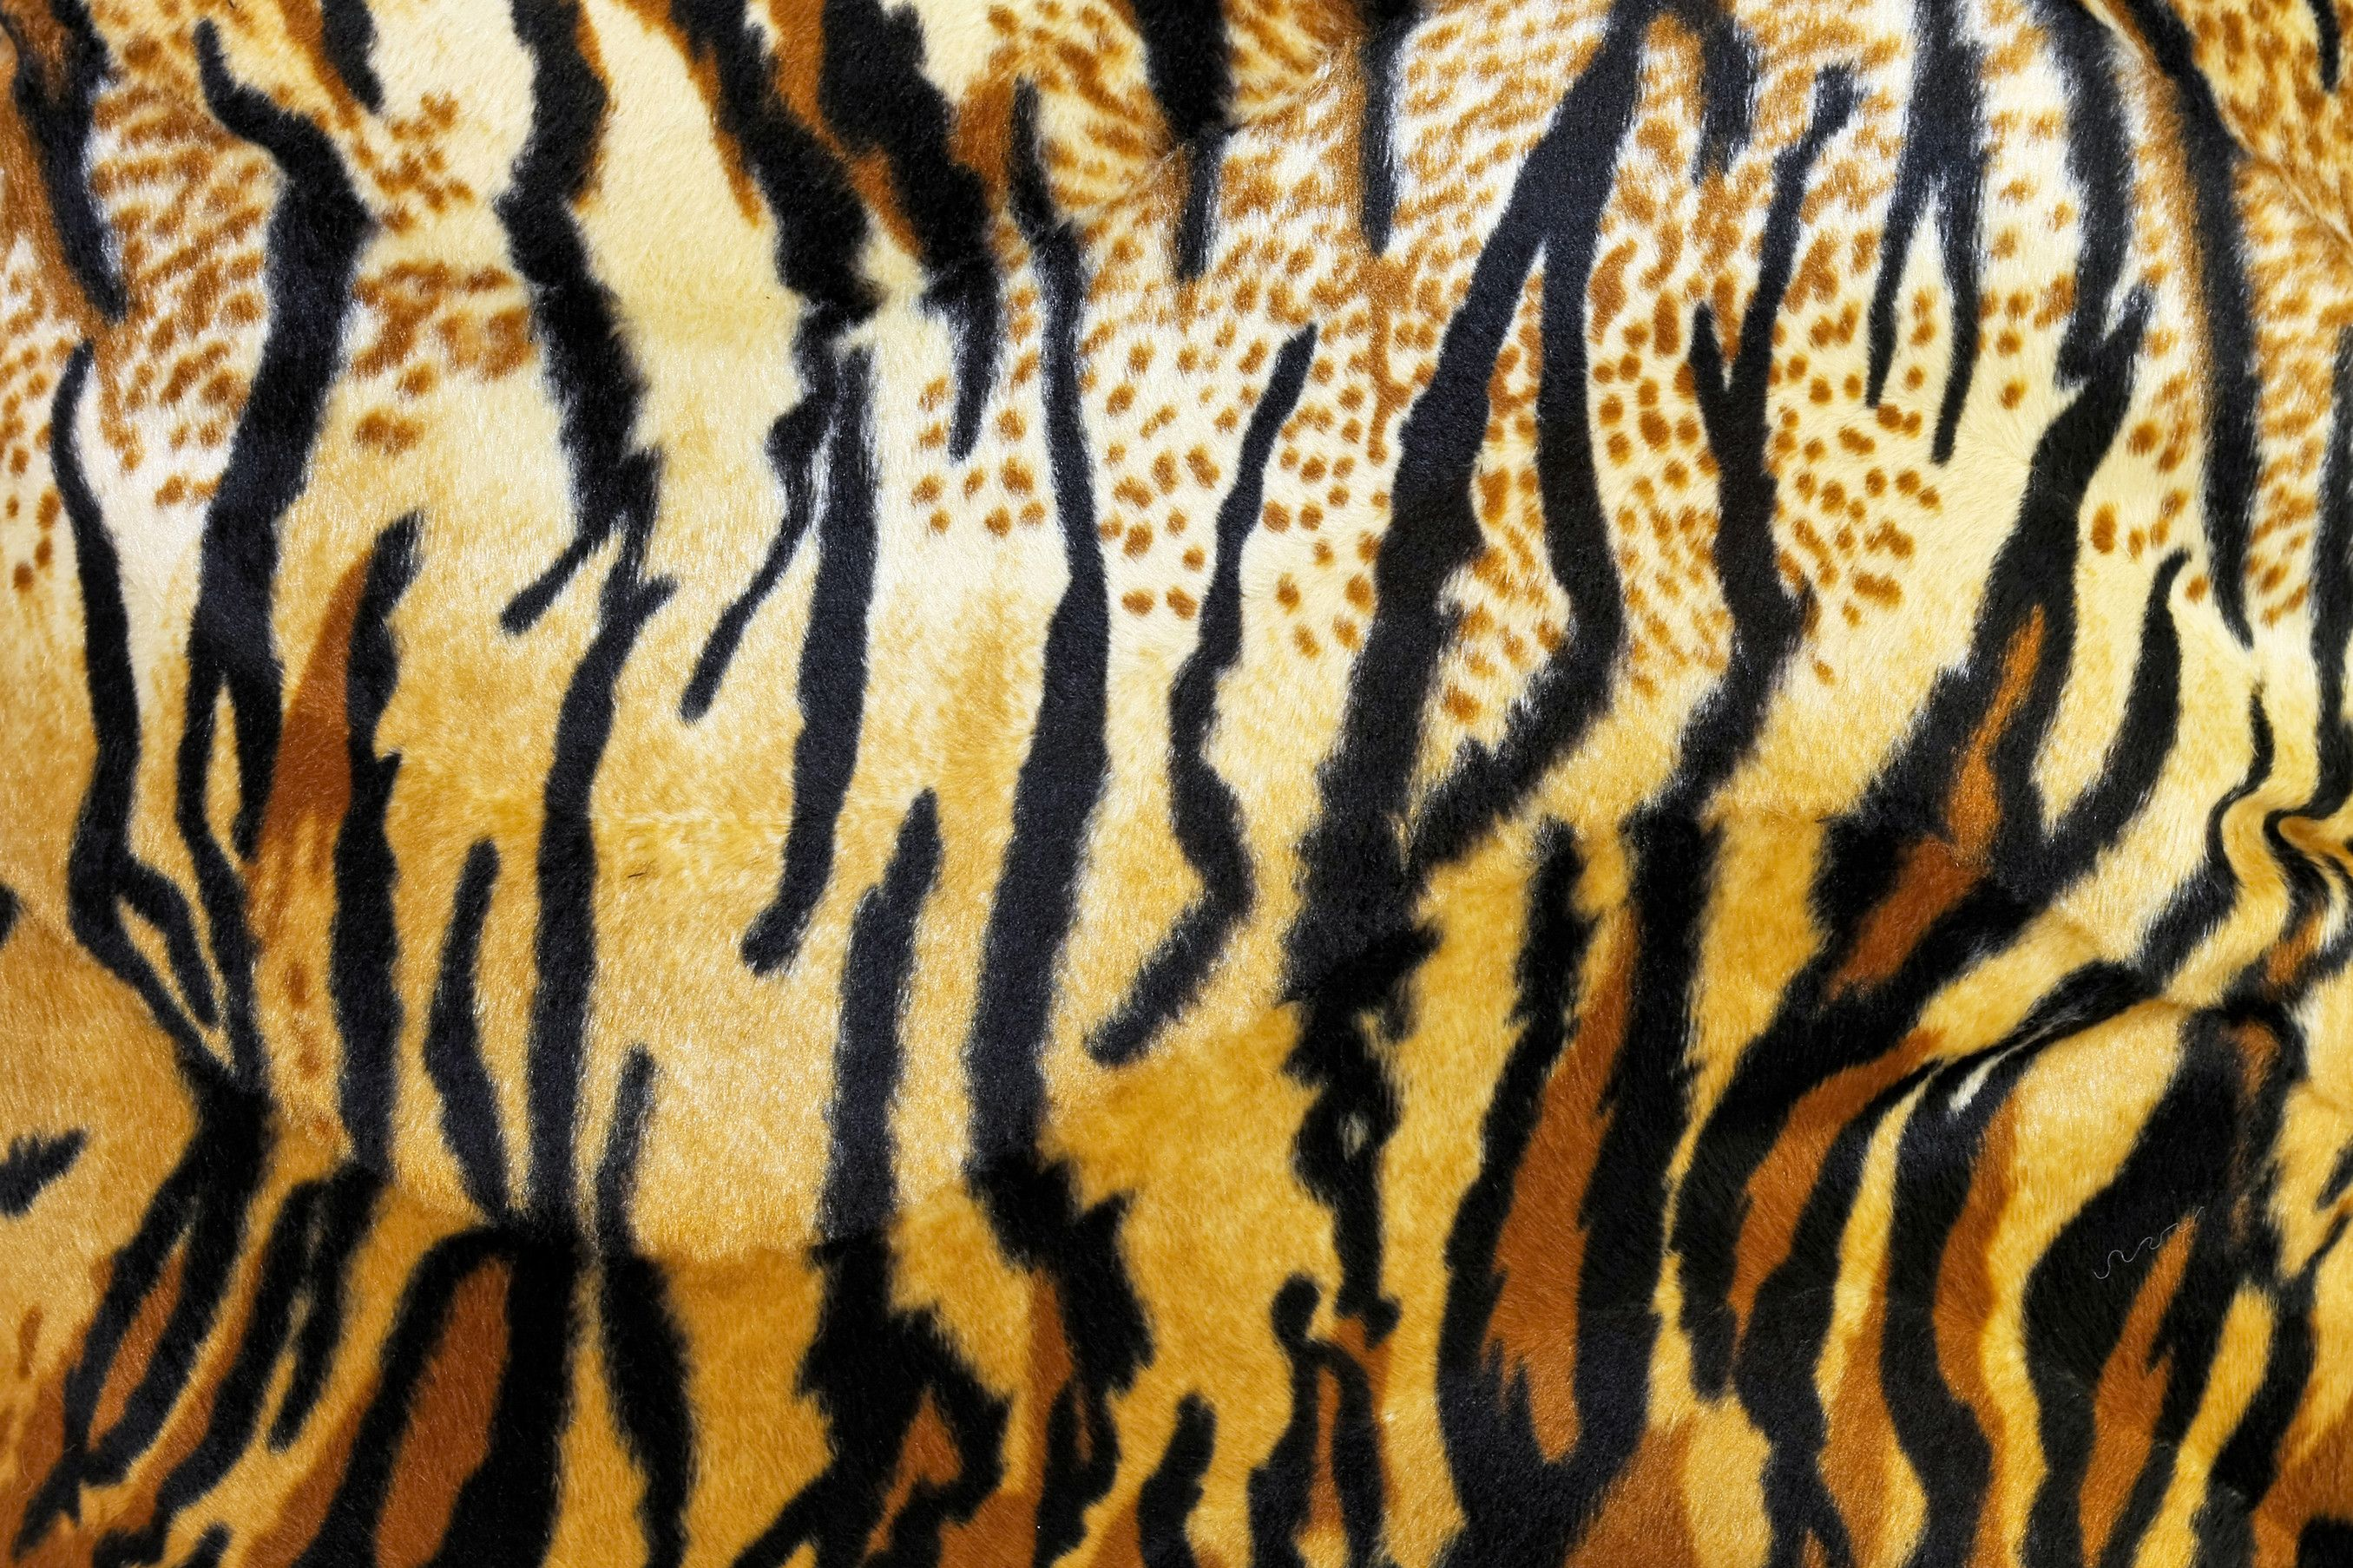 Animal Print Wallpaper Free Download Tiger Stripe Prints